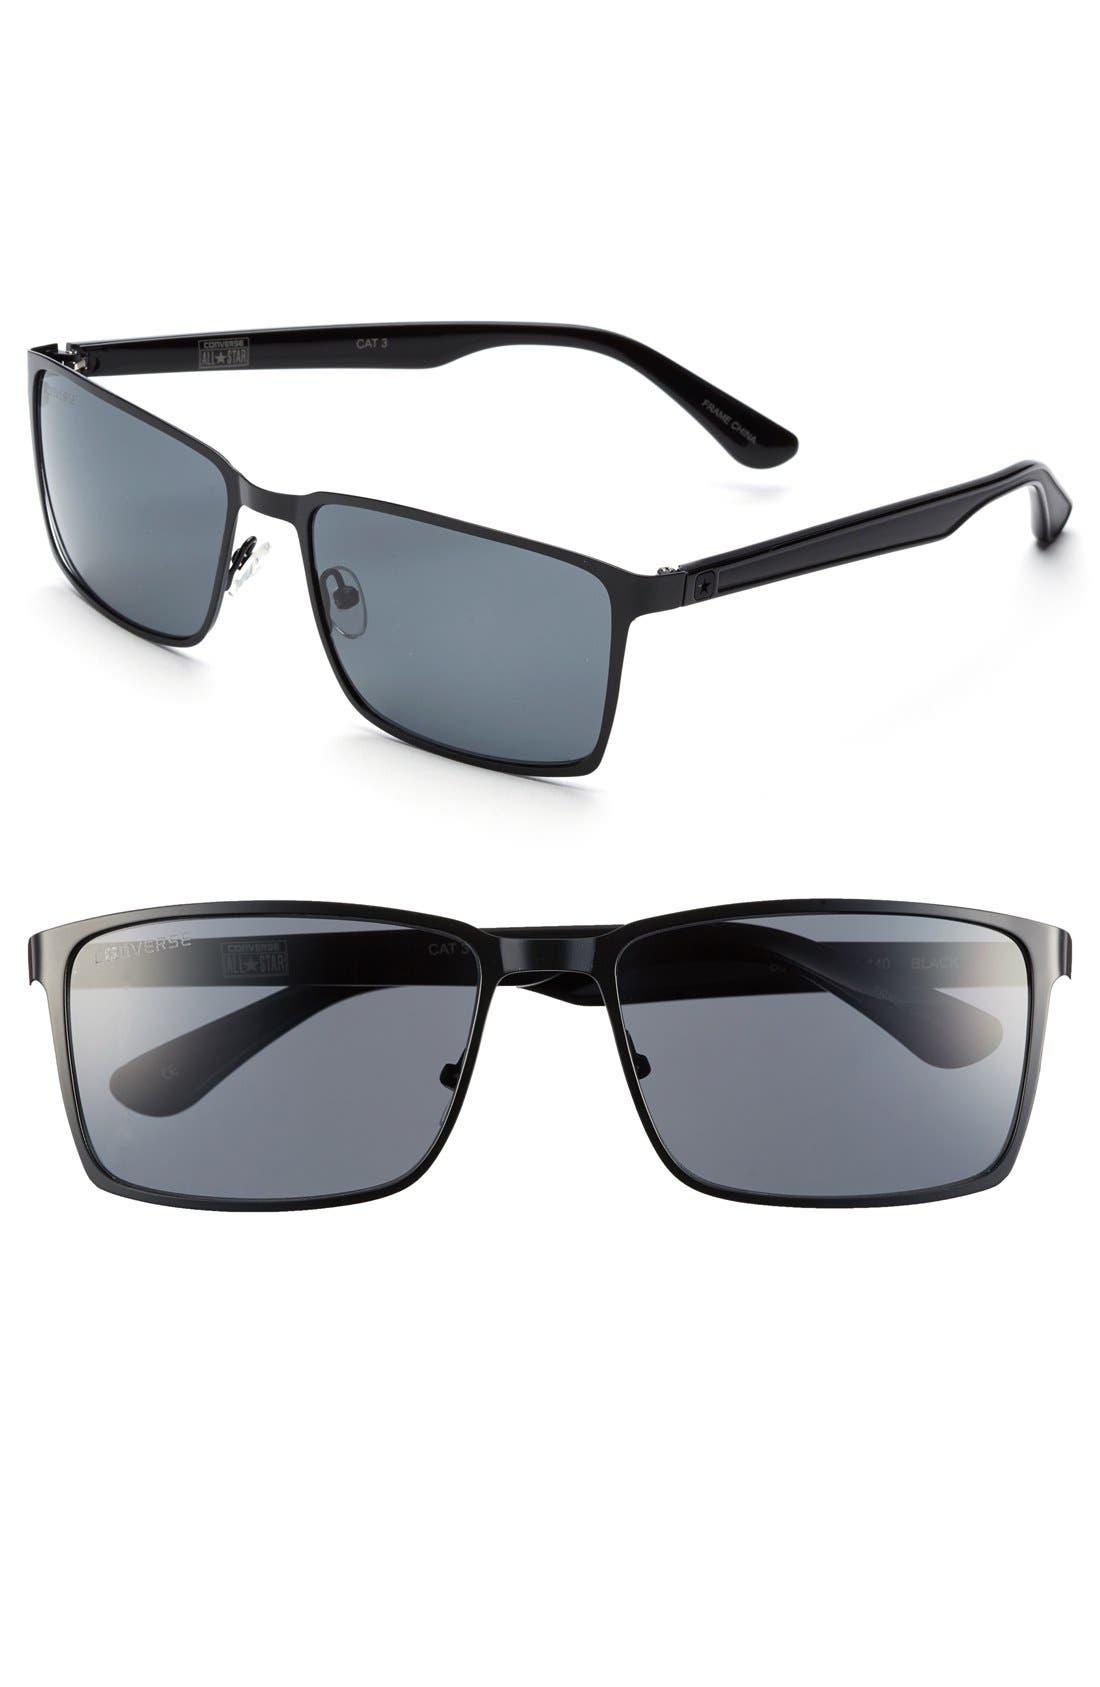 Main Image - Converse 59mm Sunglasses